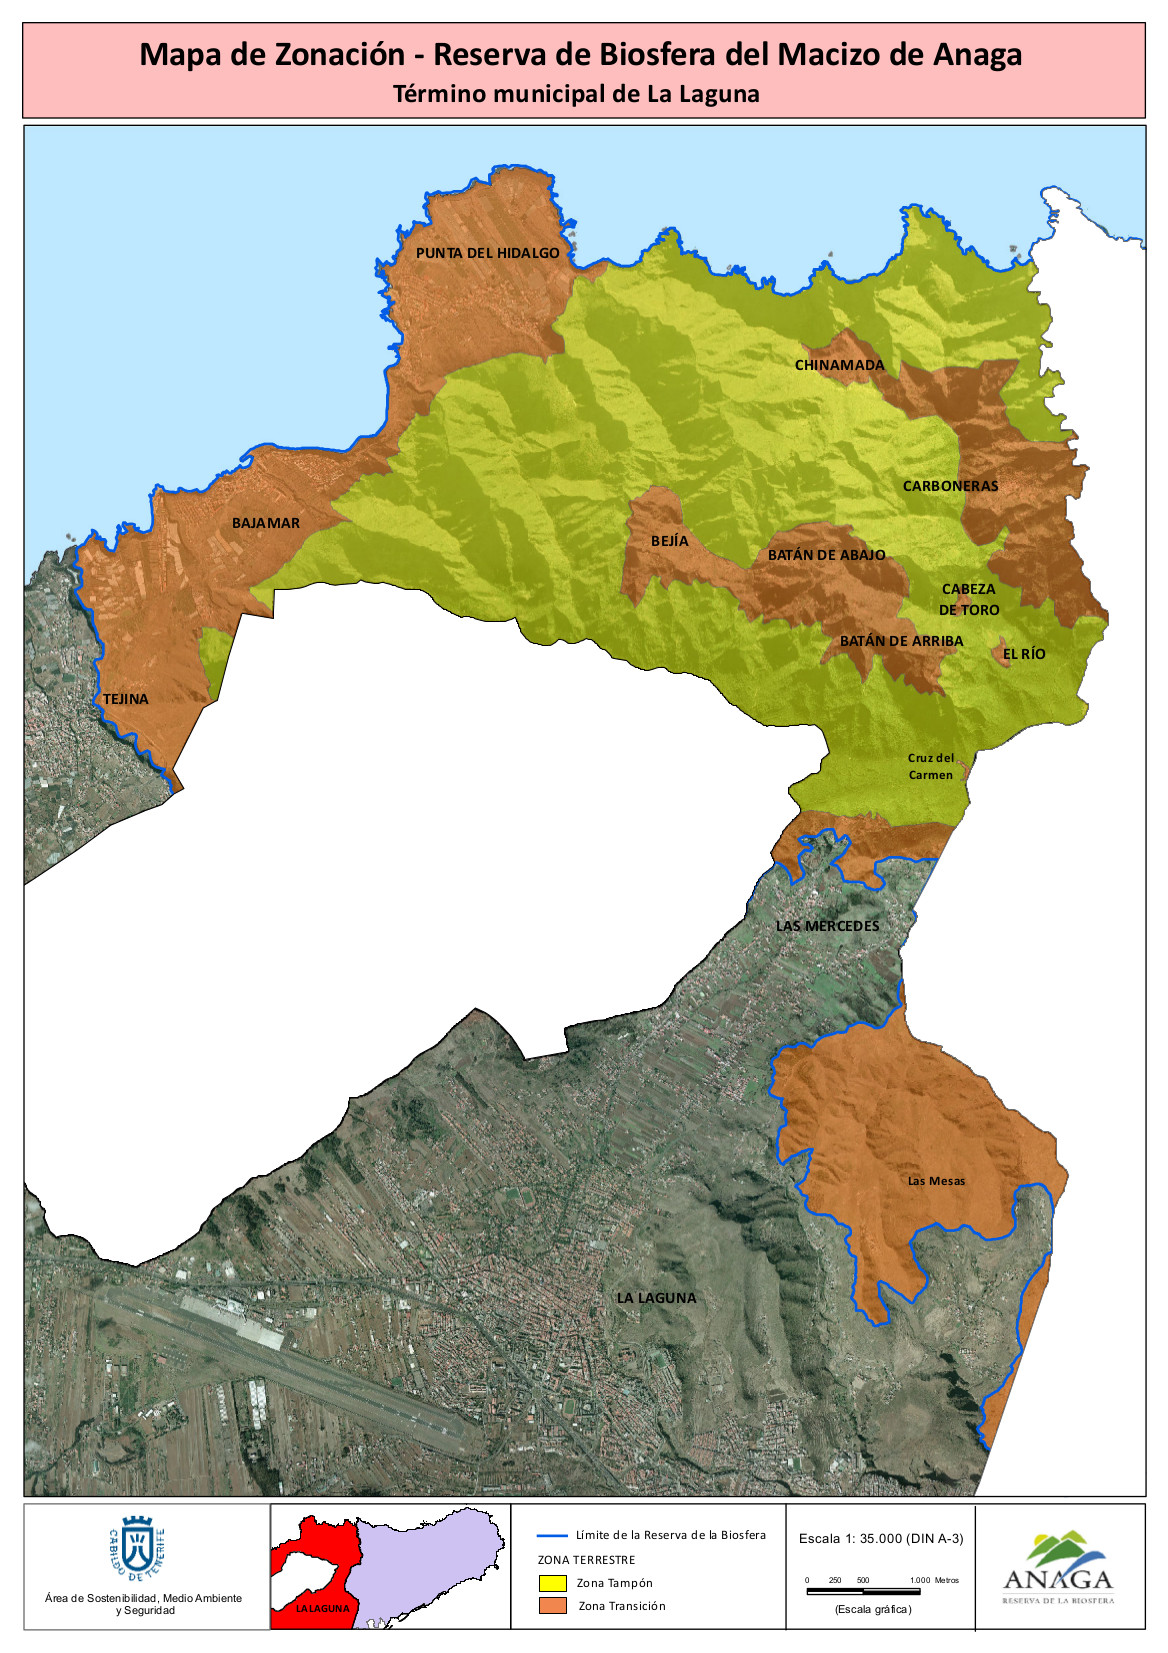 Mapa de Zonación Reserva de la Biofera del Macizo de Anaga - Término Municipal de La Laguna